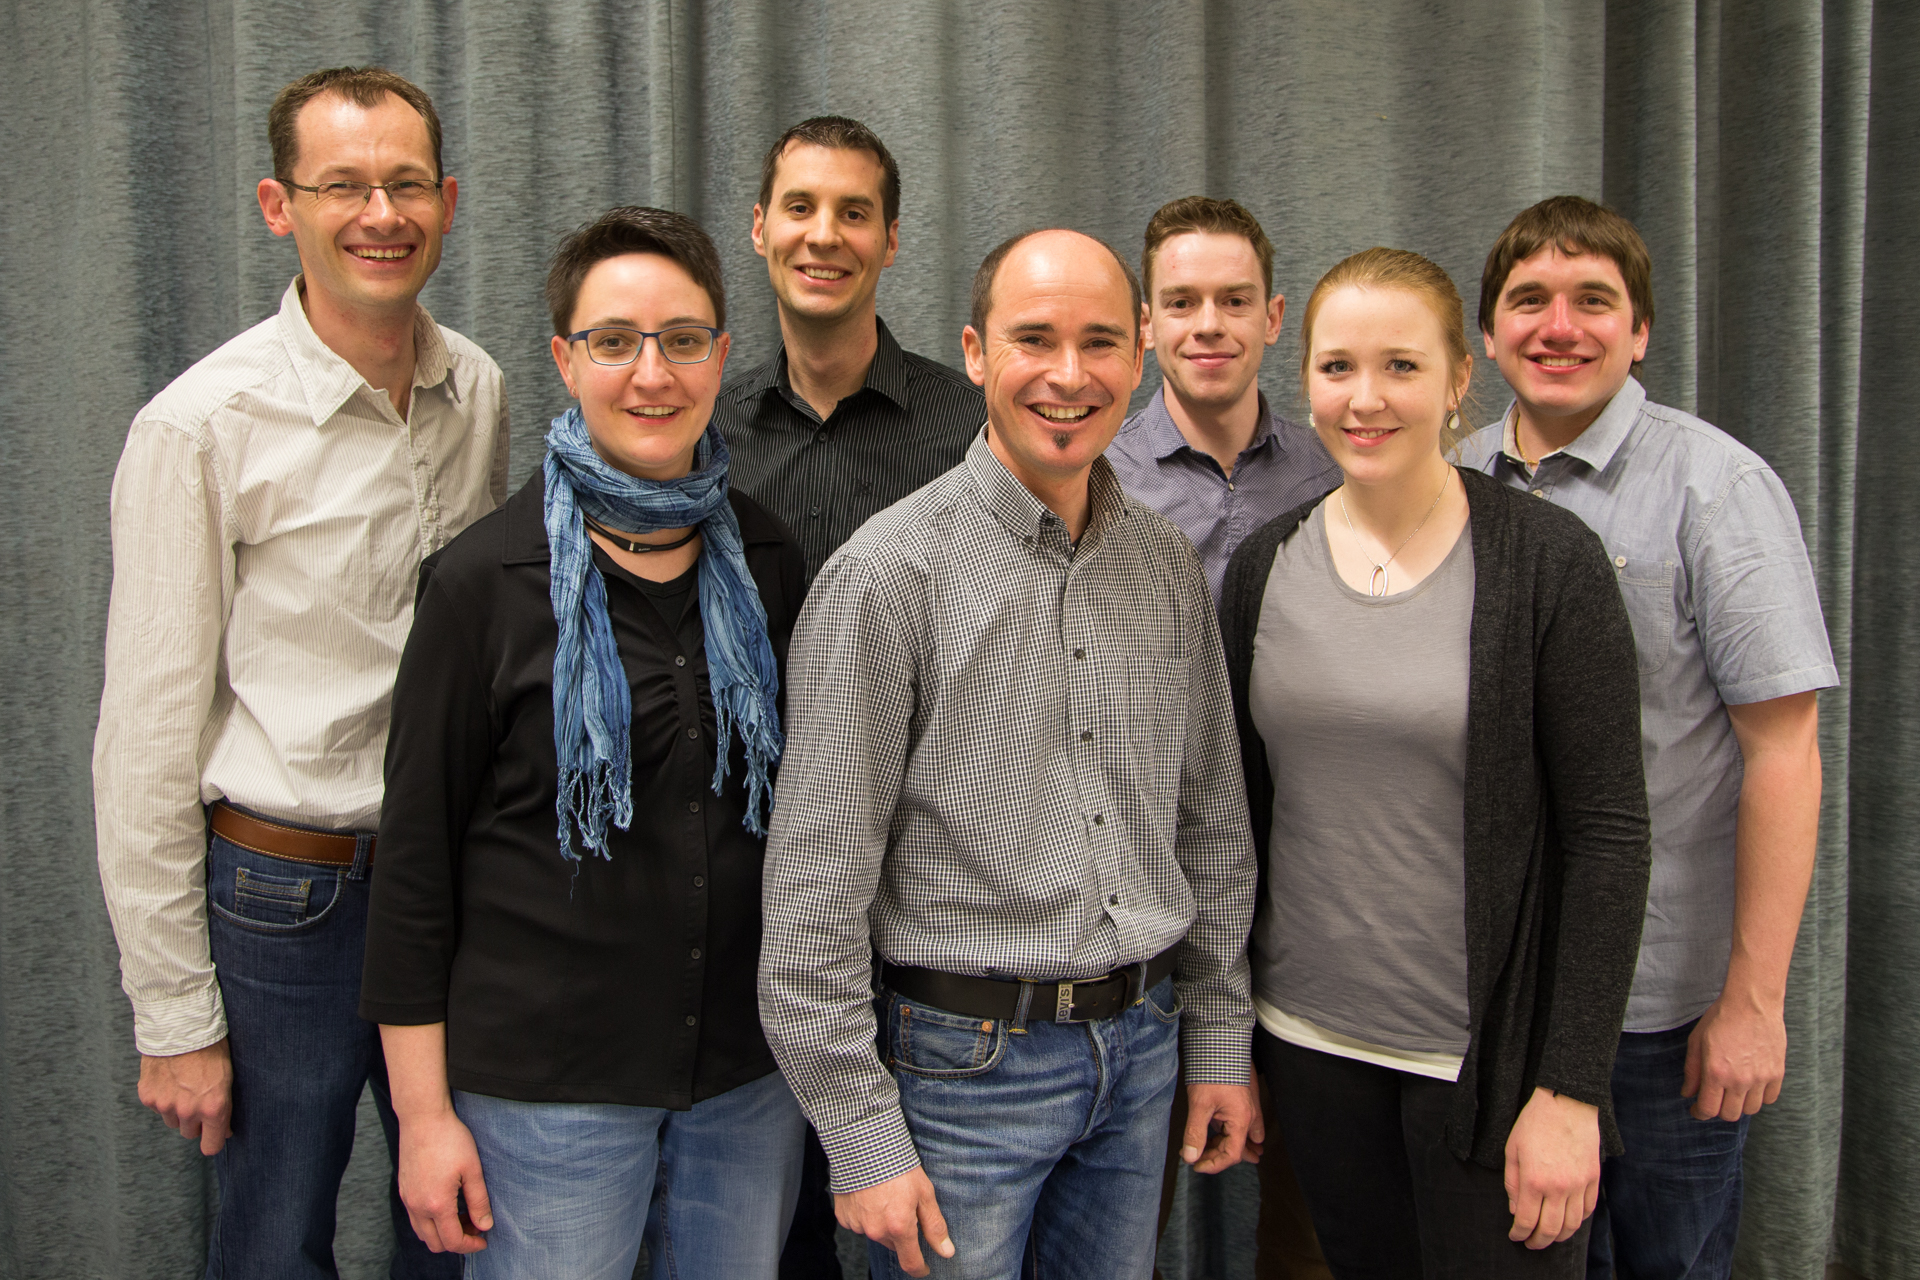 Musikkommission (von links nach rechts: Ivo Huwiler, Cornelia Morokutti, Gregor Käppeli, Roger Meier, Heinz Stalder, Sonja Wyss, Pascal Jurt)